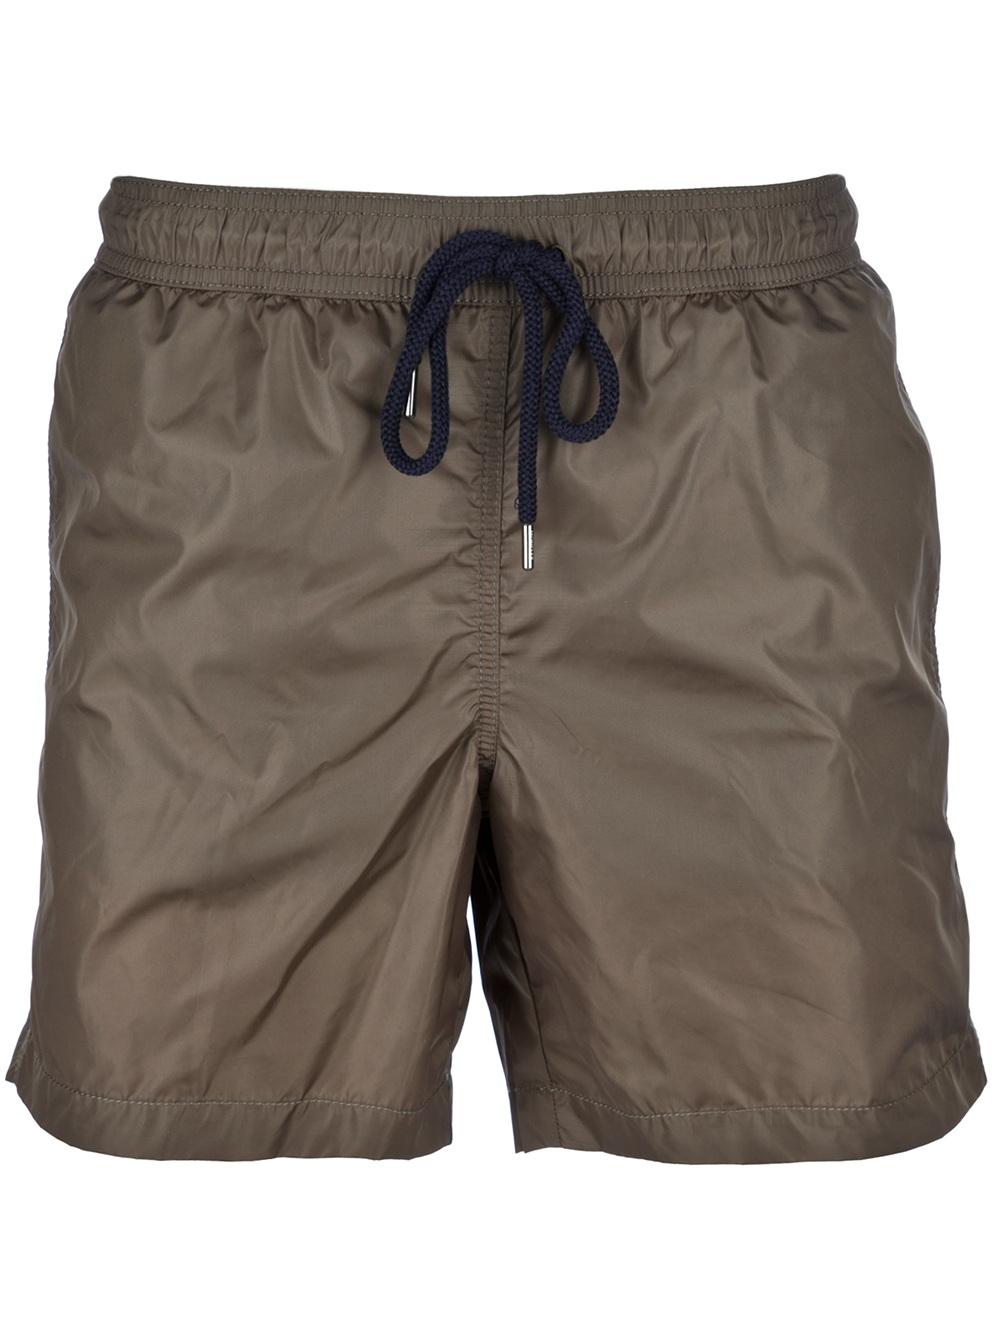 5b3496bb4112 Moncler Drawstring Swim Shorts in Green for Men - Lyst